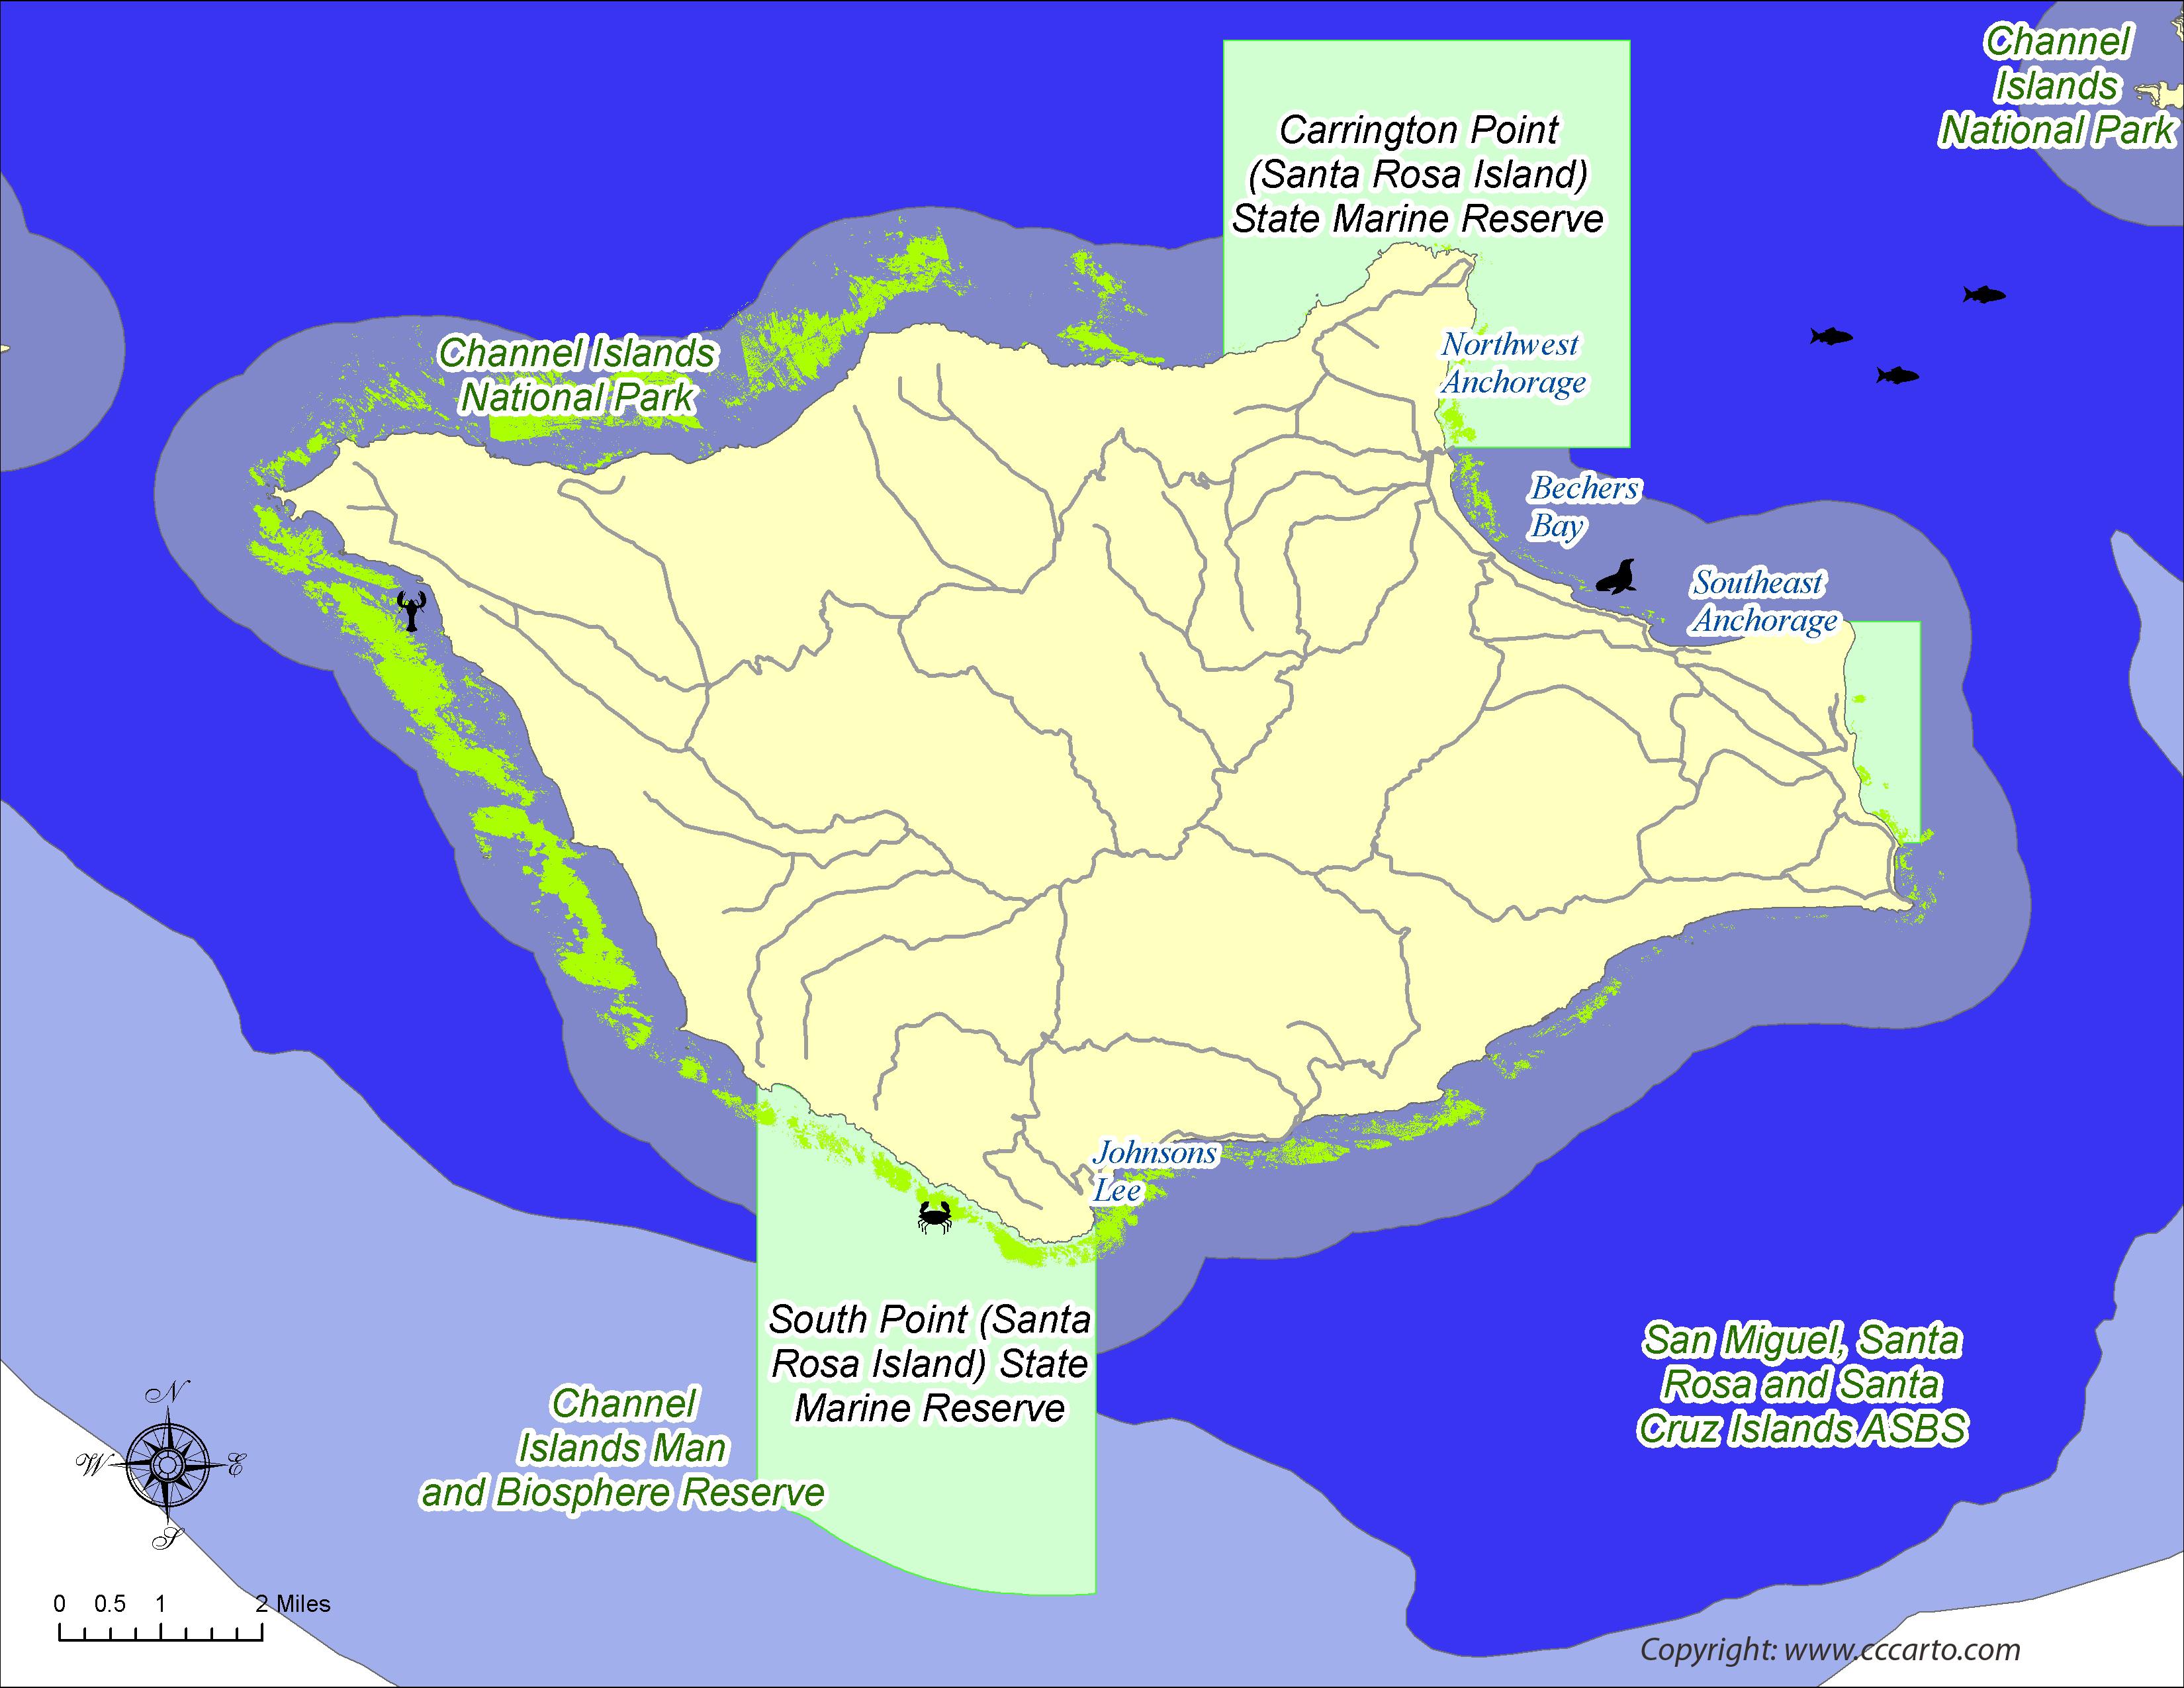 Santa Rosa Island Reserves